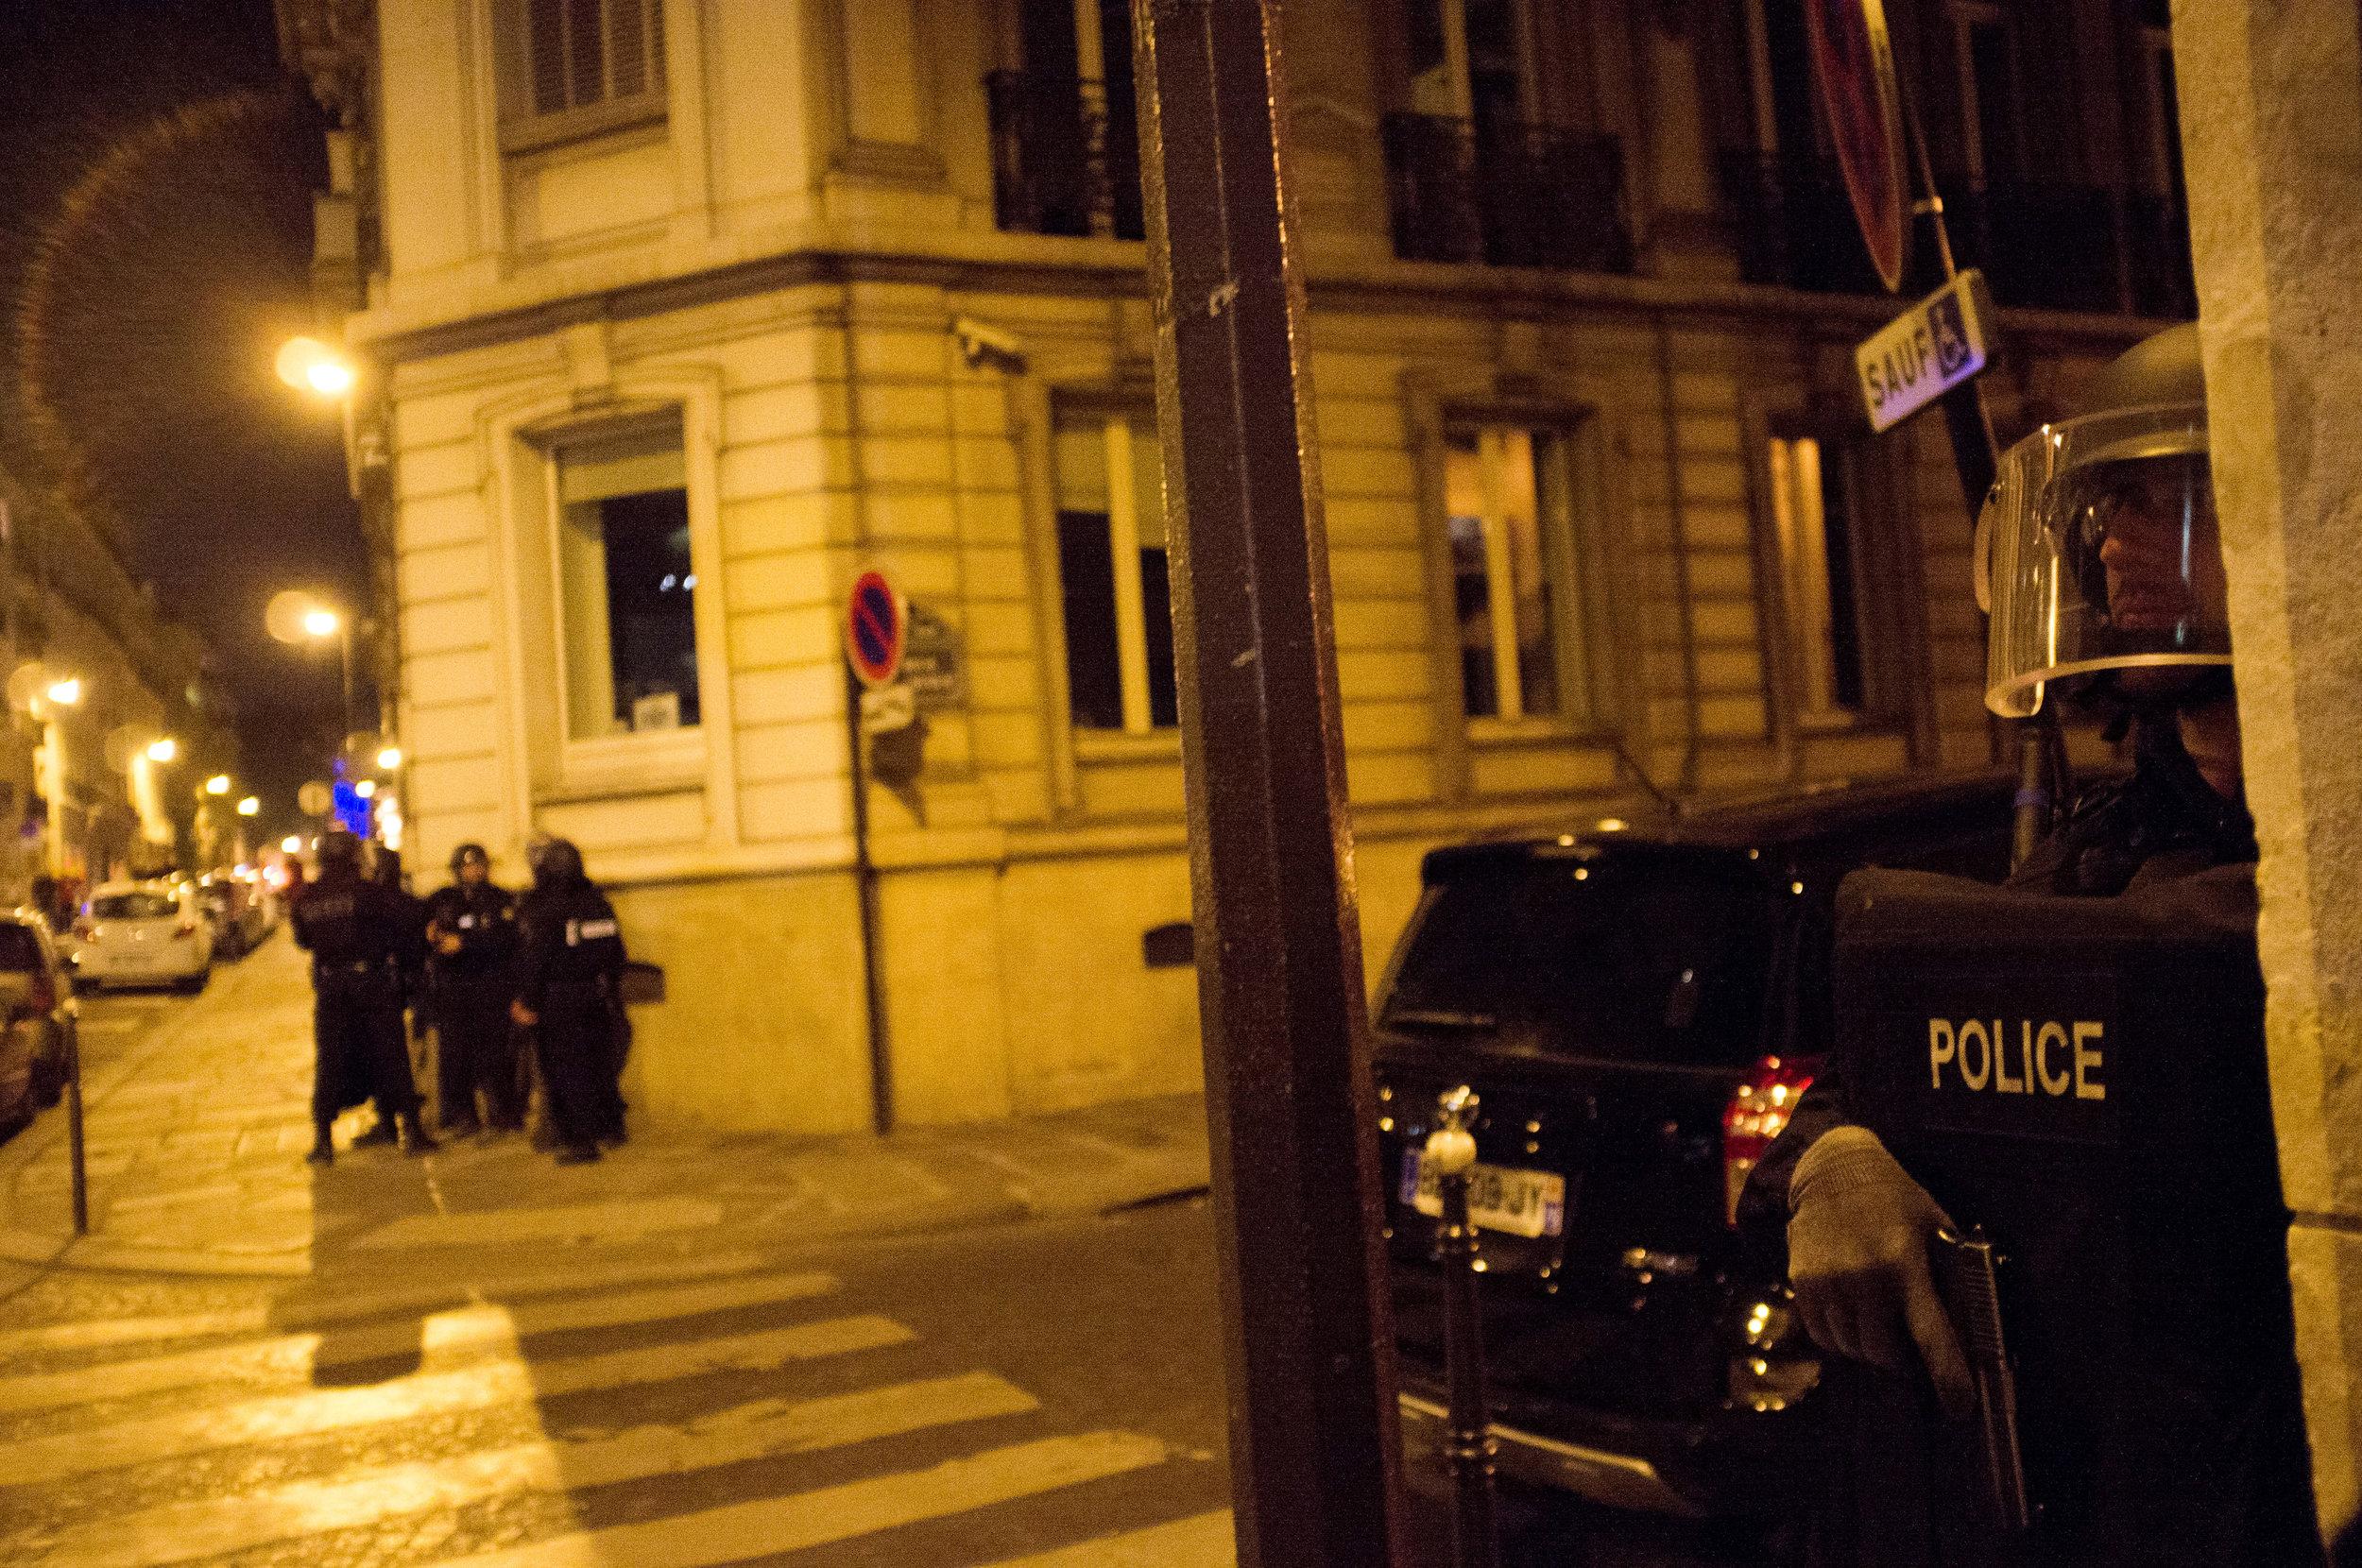 40-20170420-ATTAQUE-CHAMPS-ELYSEES-PARIS©Augustin-Le_Gall-Haytham-Pictures-DSCF6406.jpg